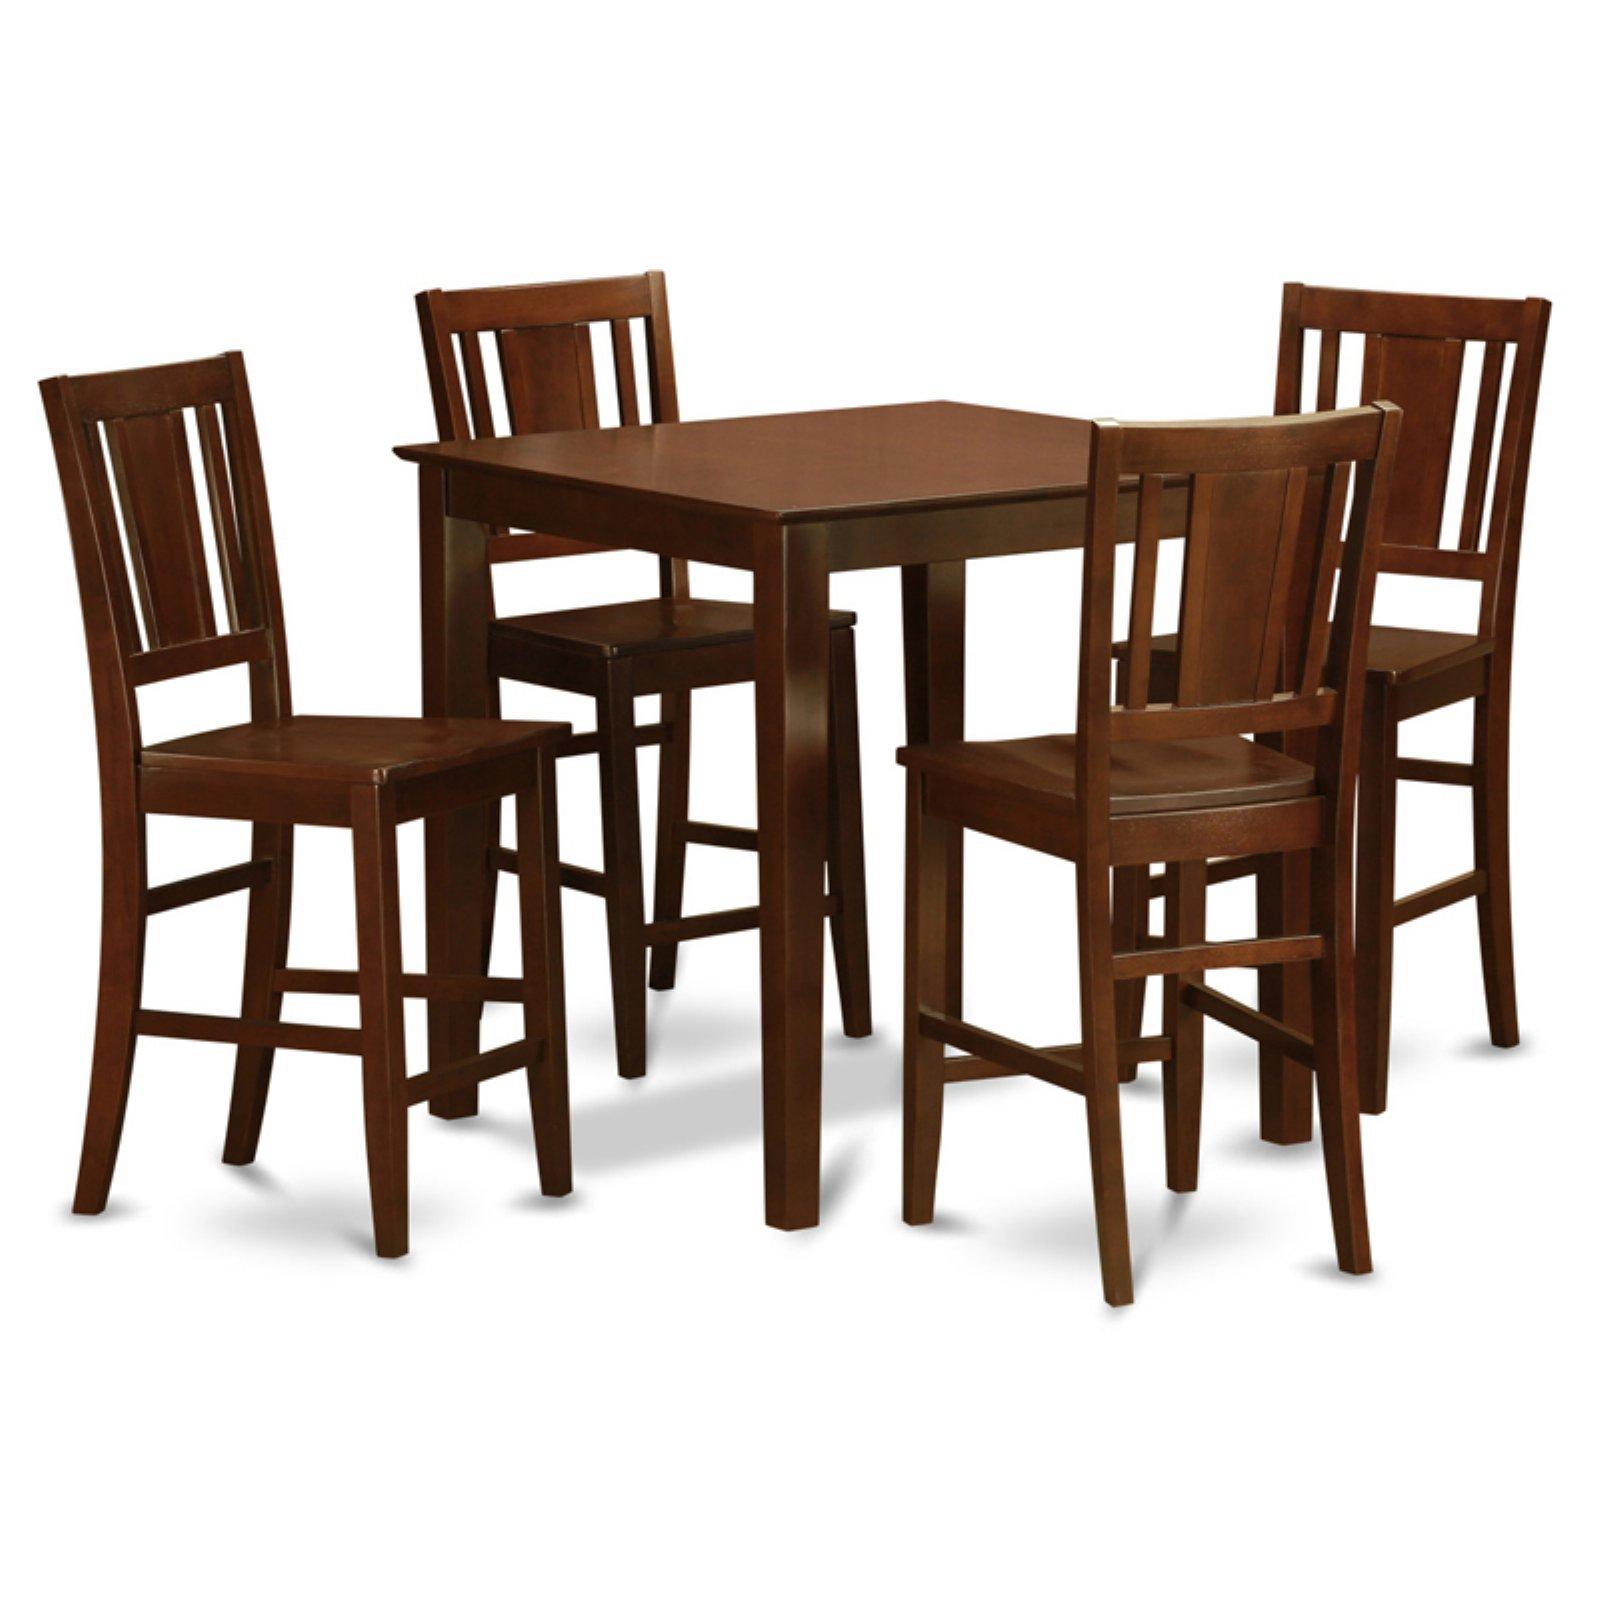 East West Furniture Vernon 5 Piece Scotch Art Dining Table Set